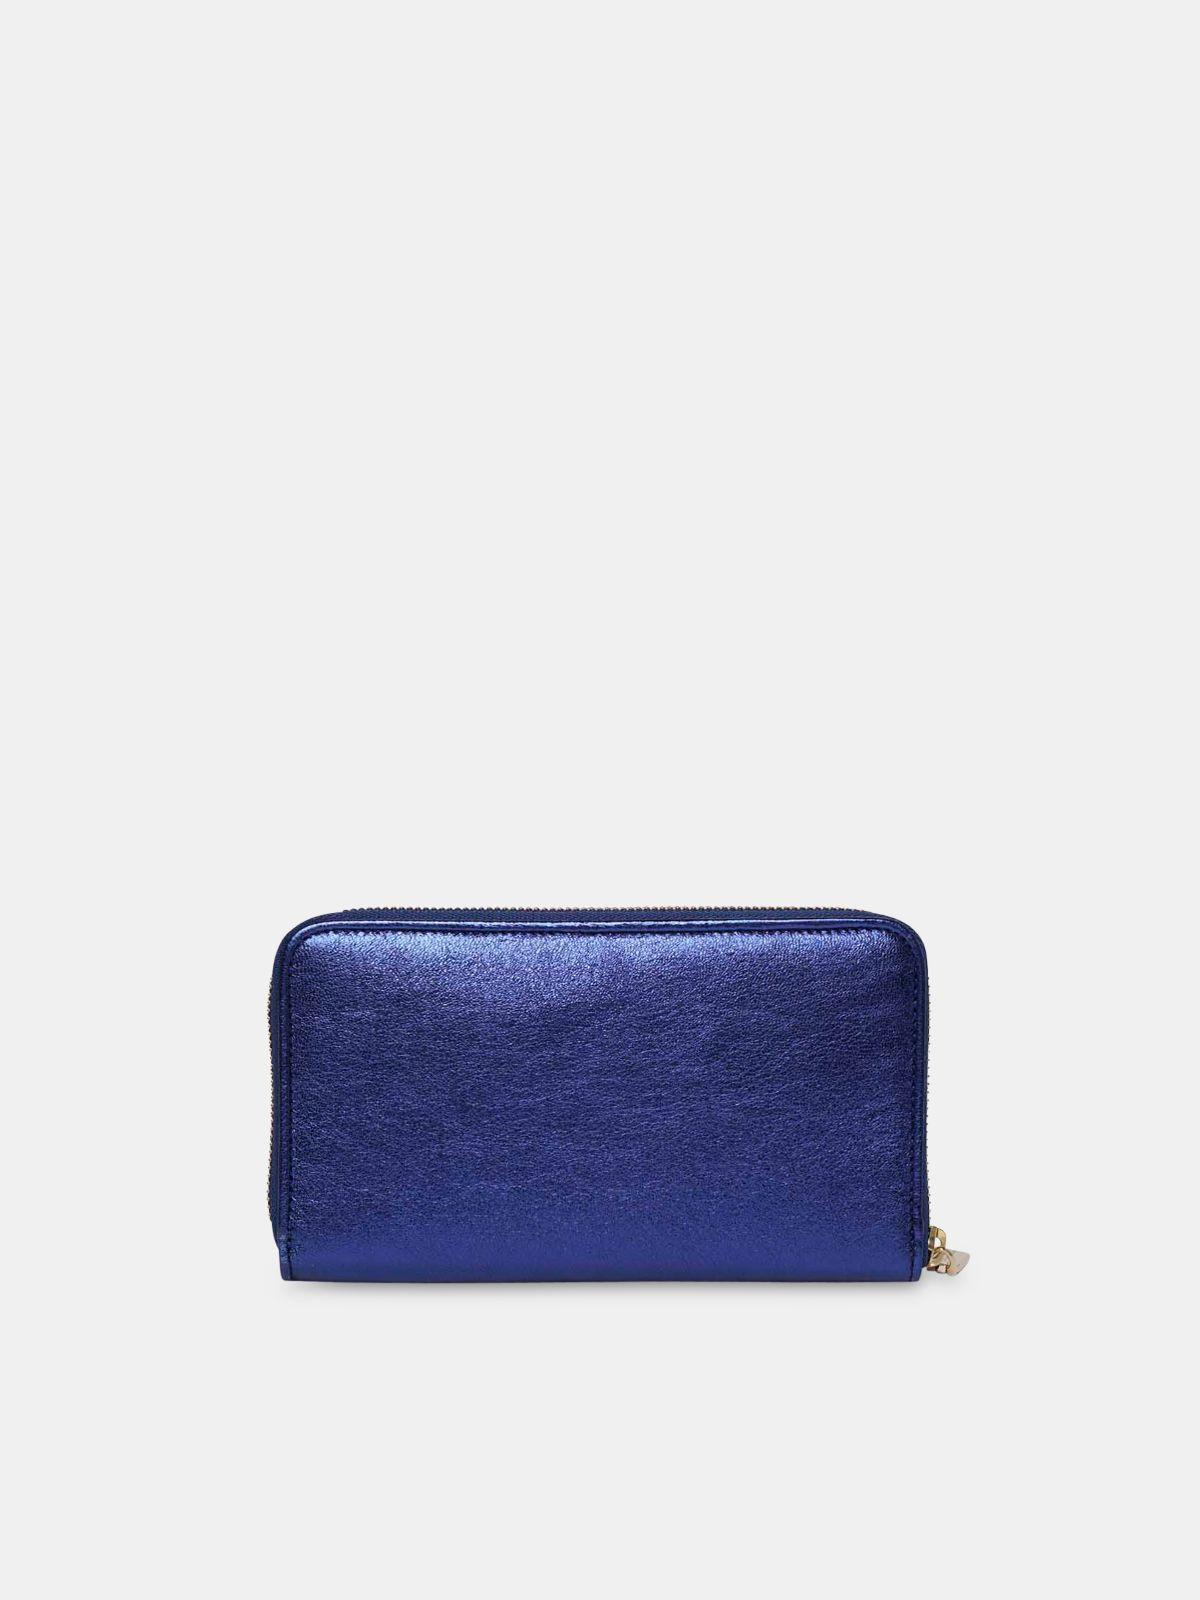 Golden Goose - Cartera Star Wallet large azul metalizado   in